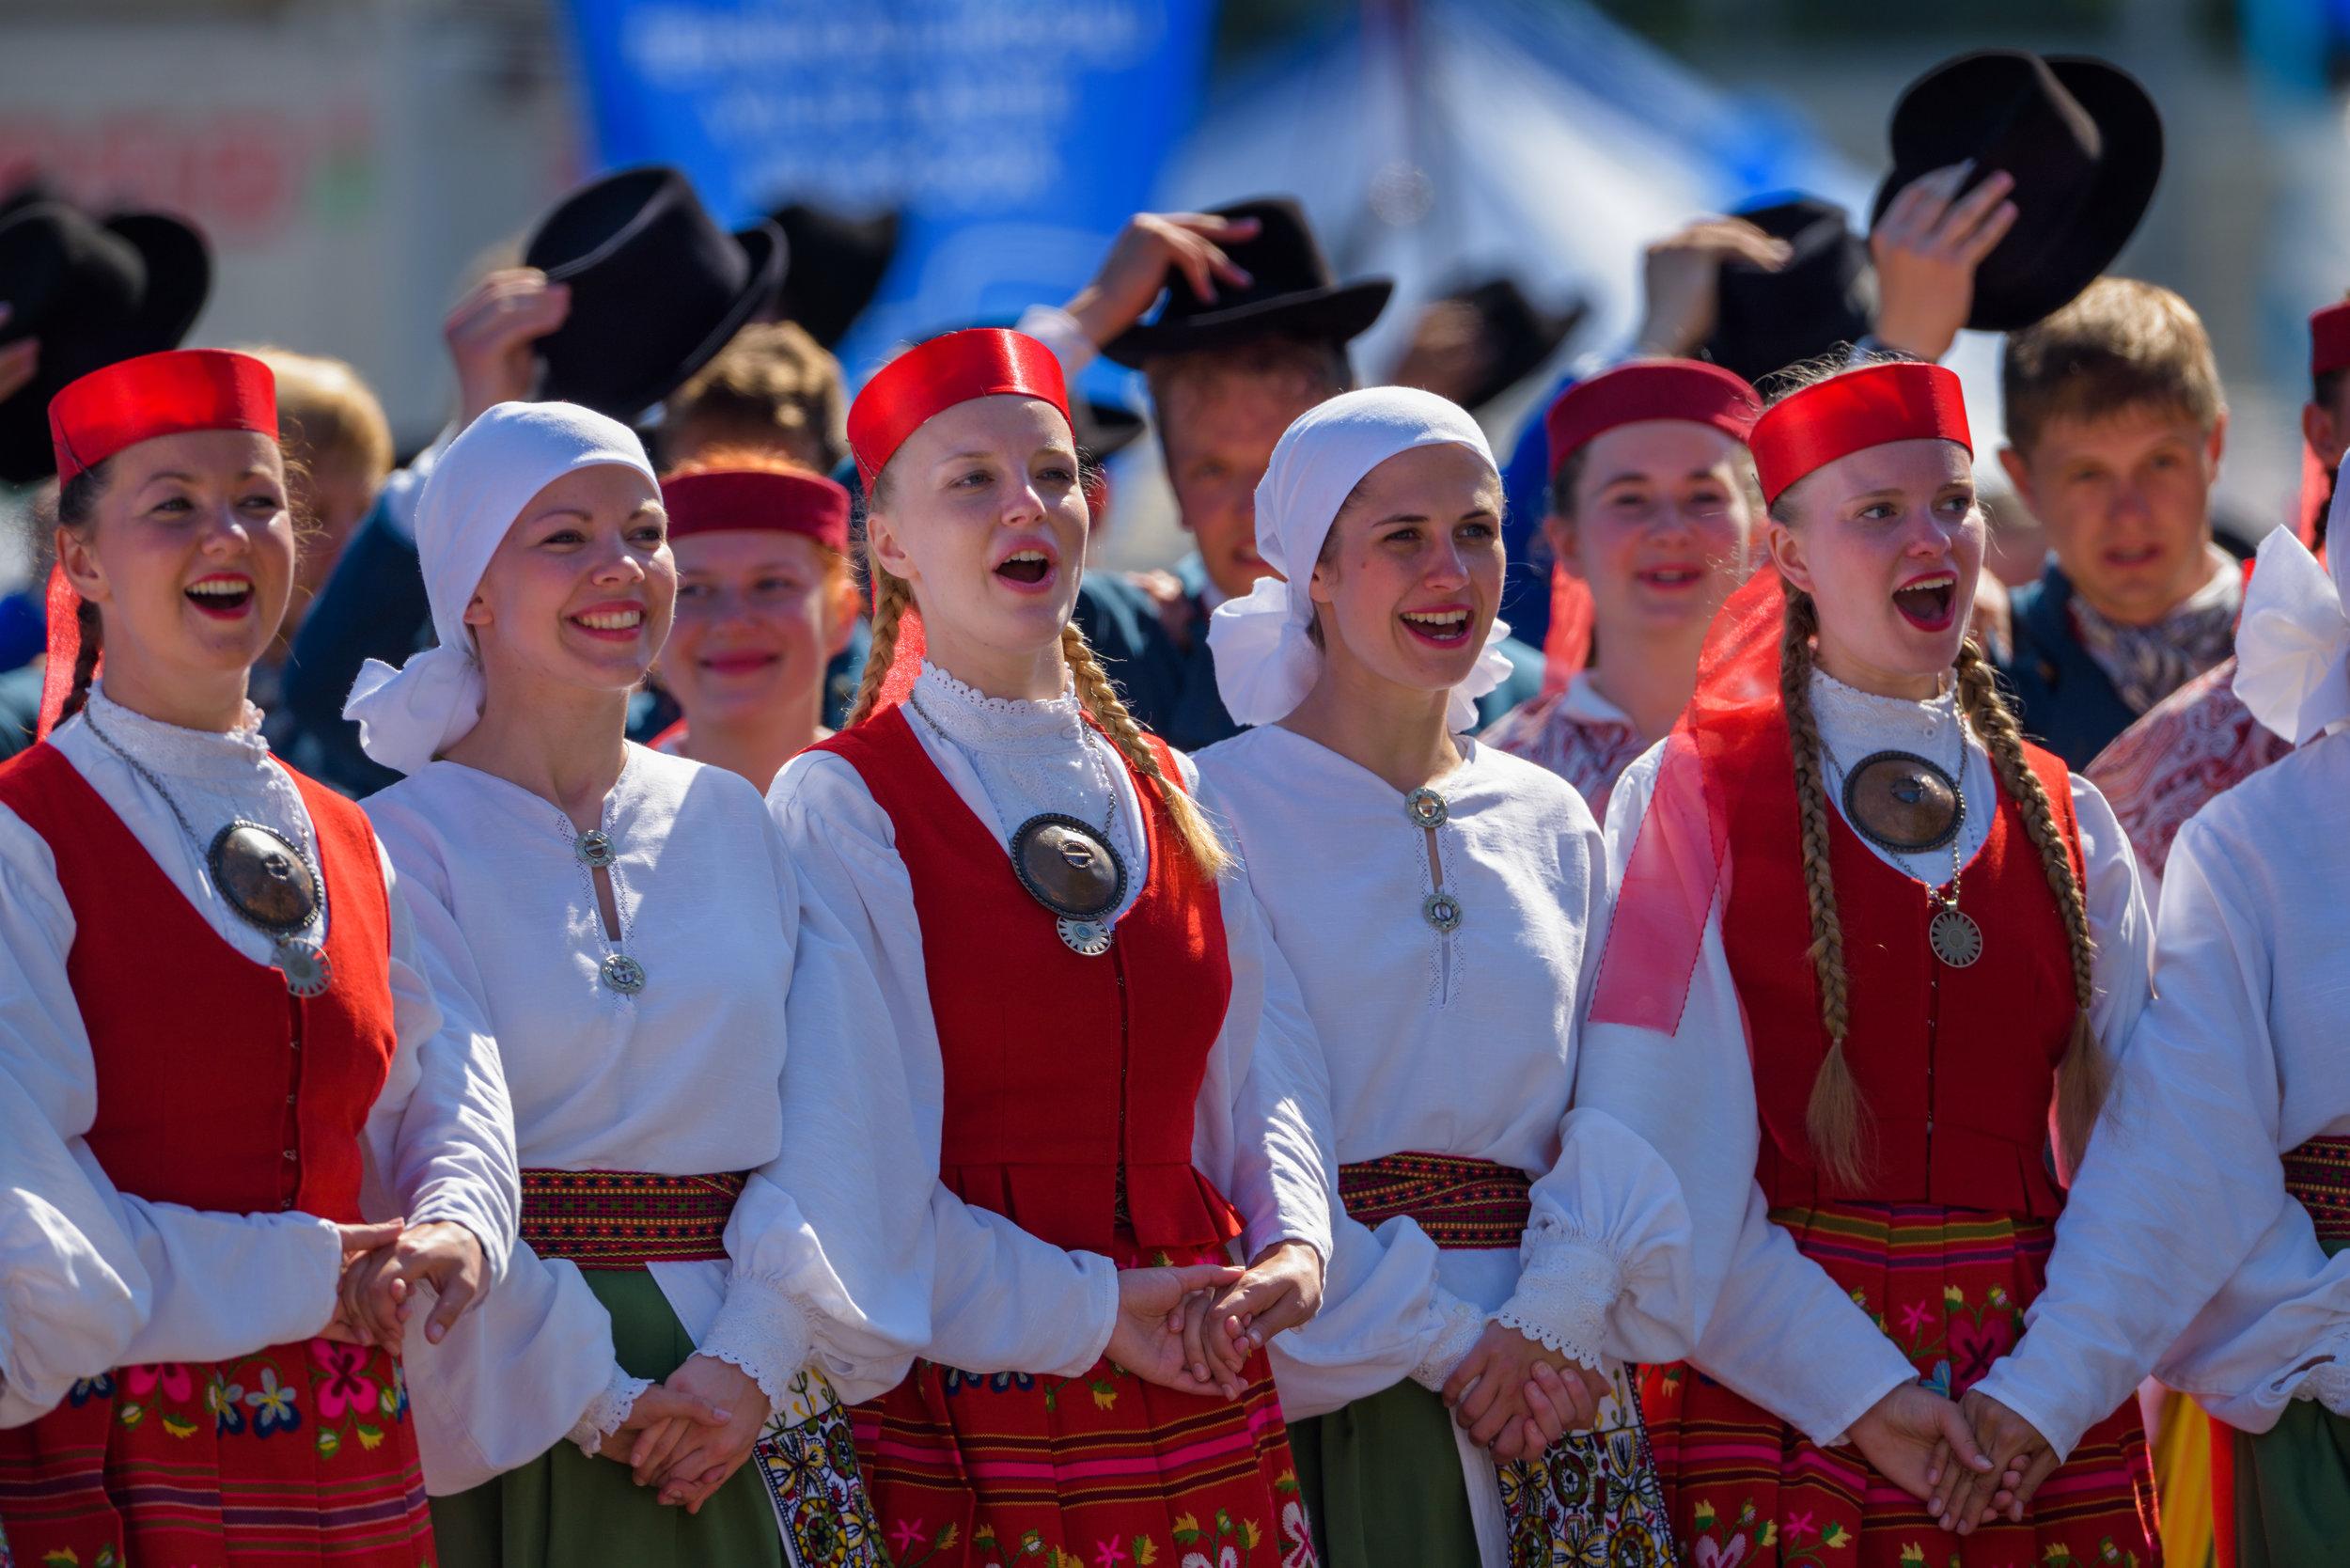 Tallinn, EstoniaParade through city and opening ceremony